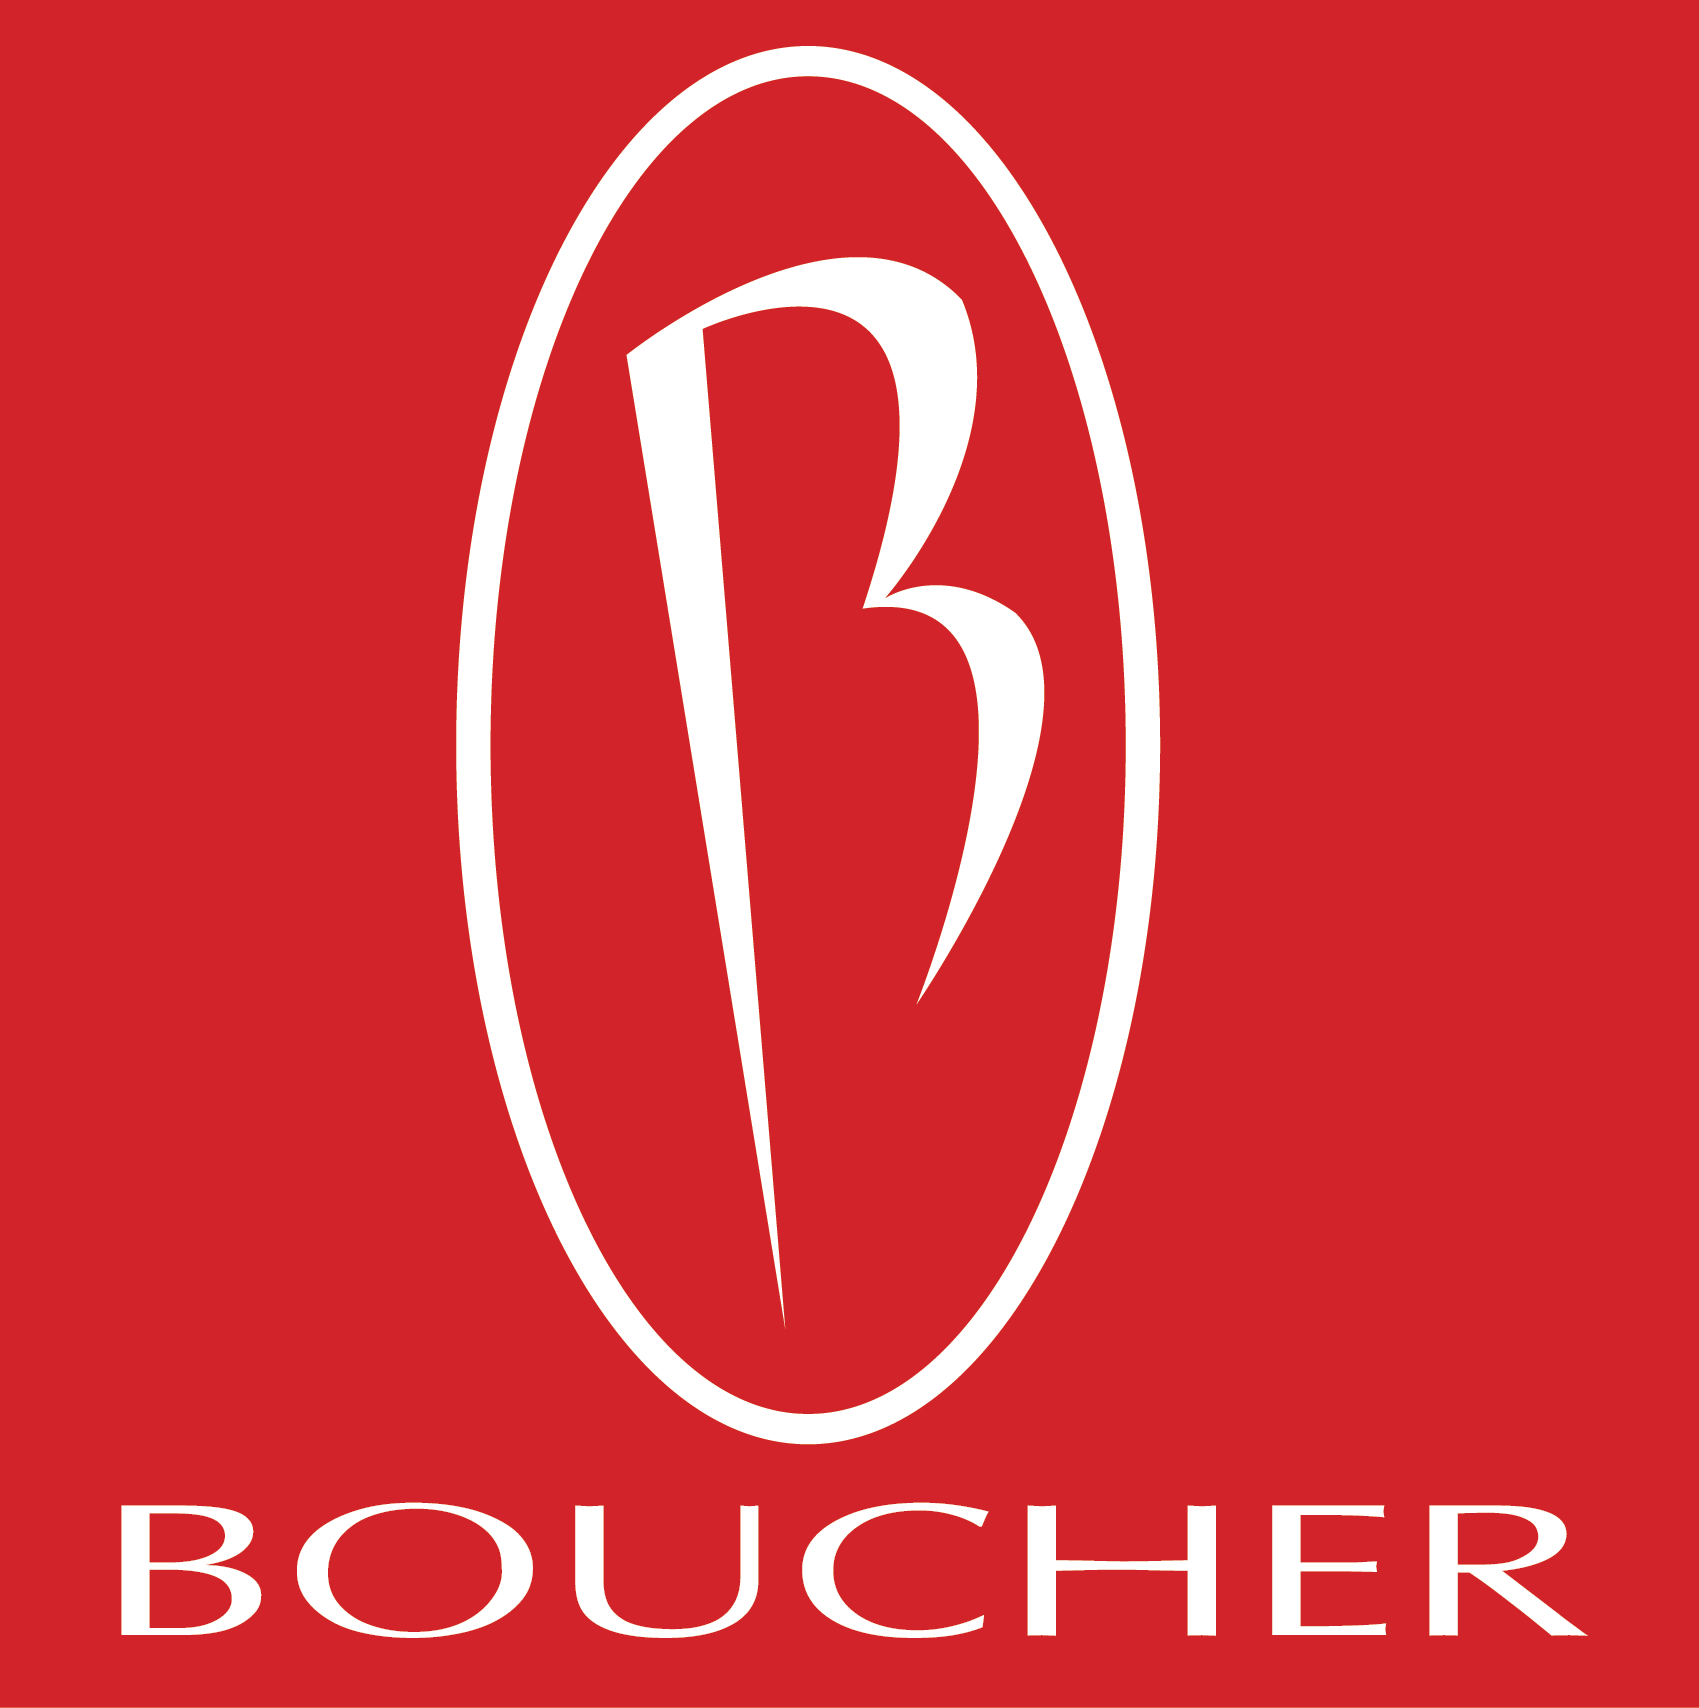 Boucher Automotive Group logo